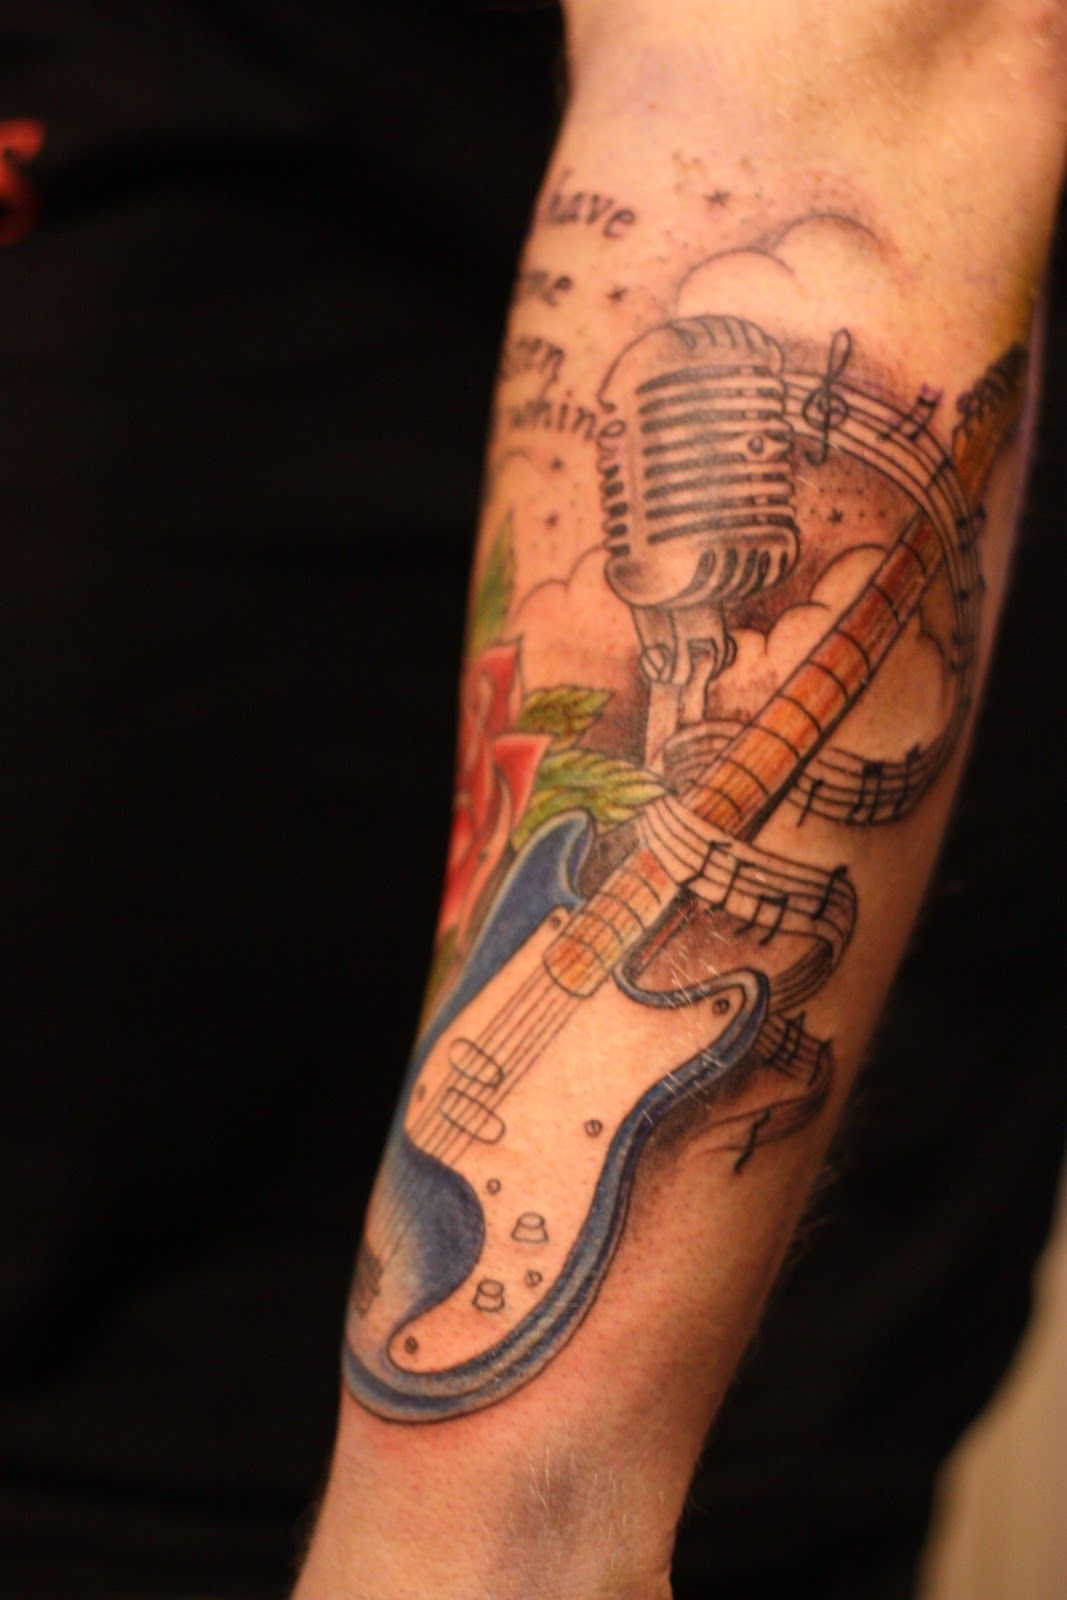 rockabilly guitar tattoo designs old school rose guitar rockabilly sleeve tattoo designs for. Black Bedroom Furniture Sets. Home Design Ideas